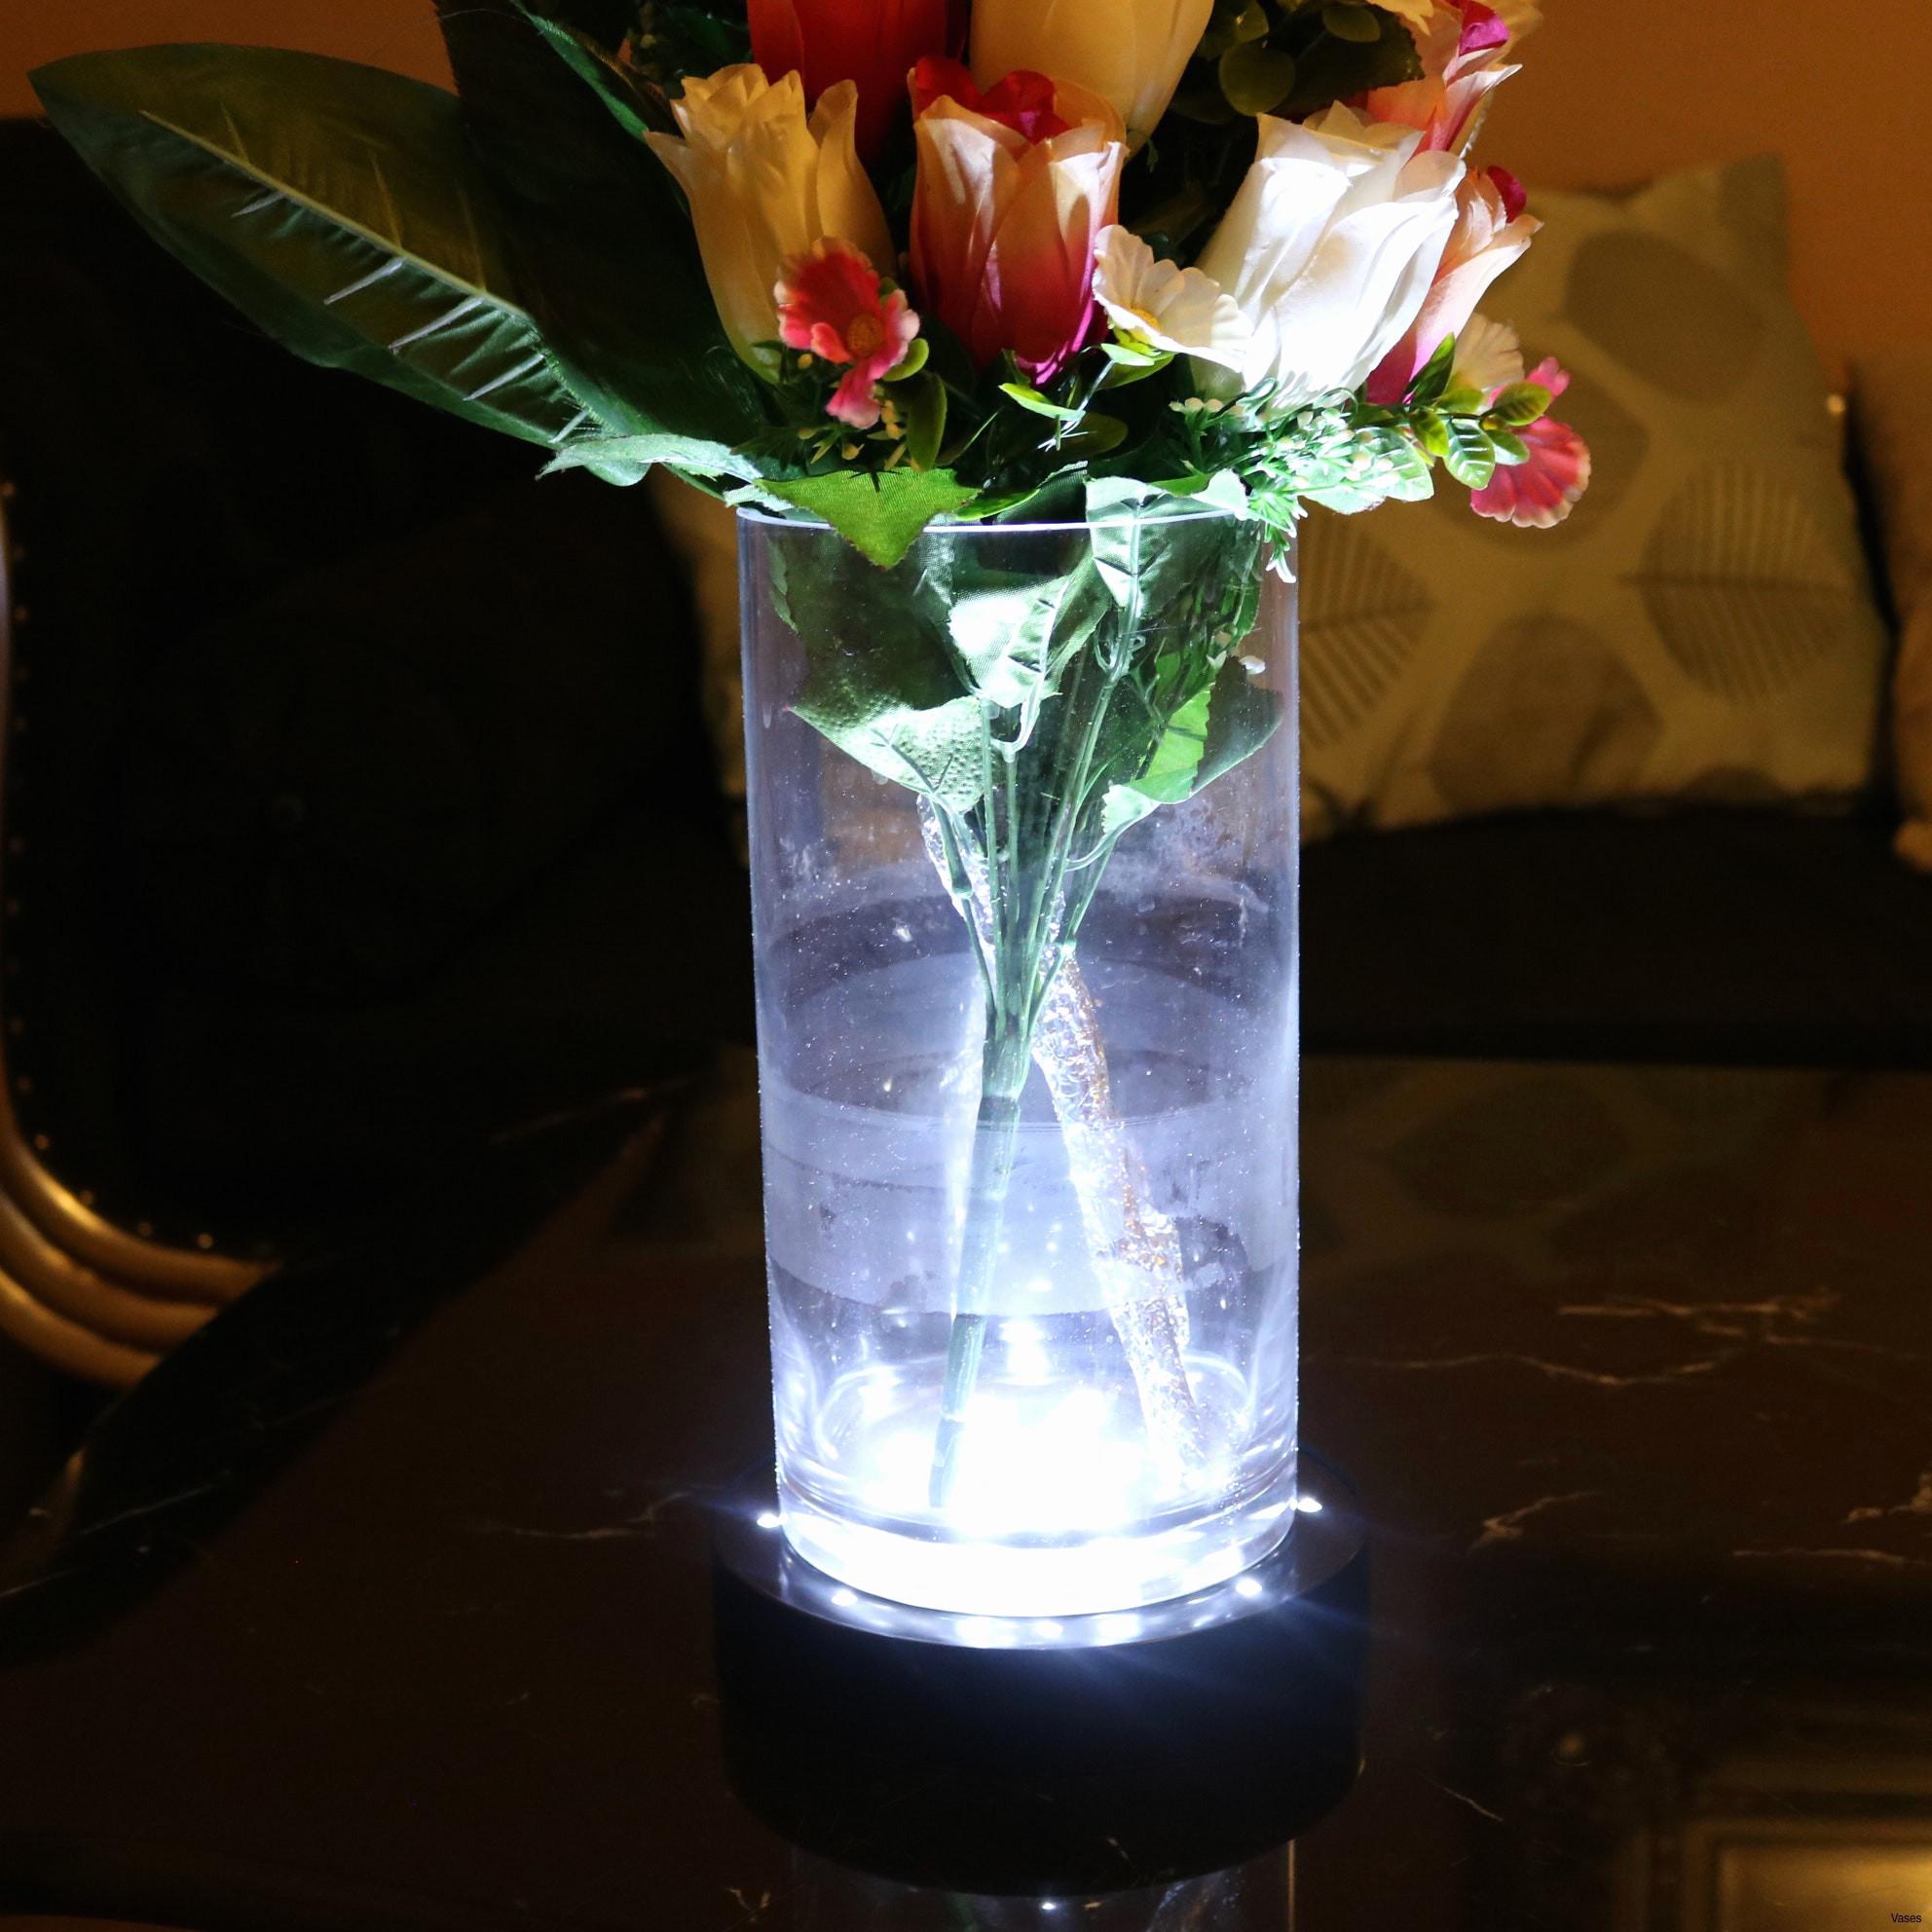 square vase flower arrangements of best flowers for wedding lovely mirrored square vase 3h vases mirror in best flowers for wedding luxury 7 elegant wedding bouquet holder for silk flowers pics